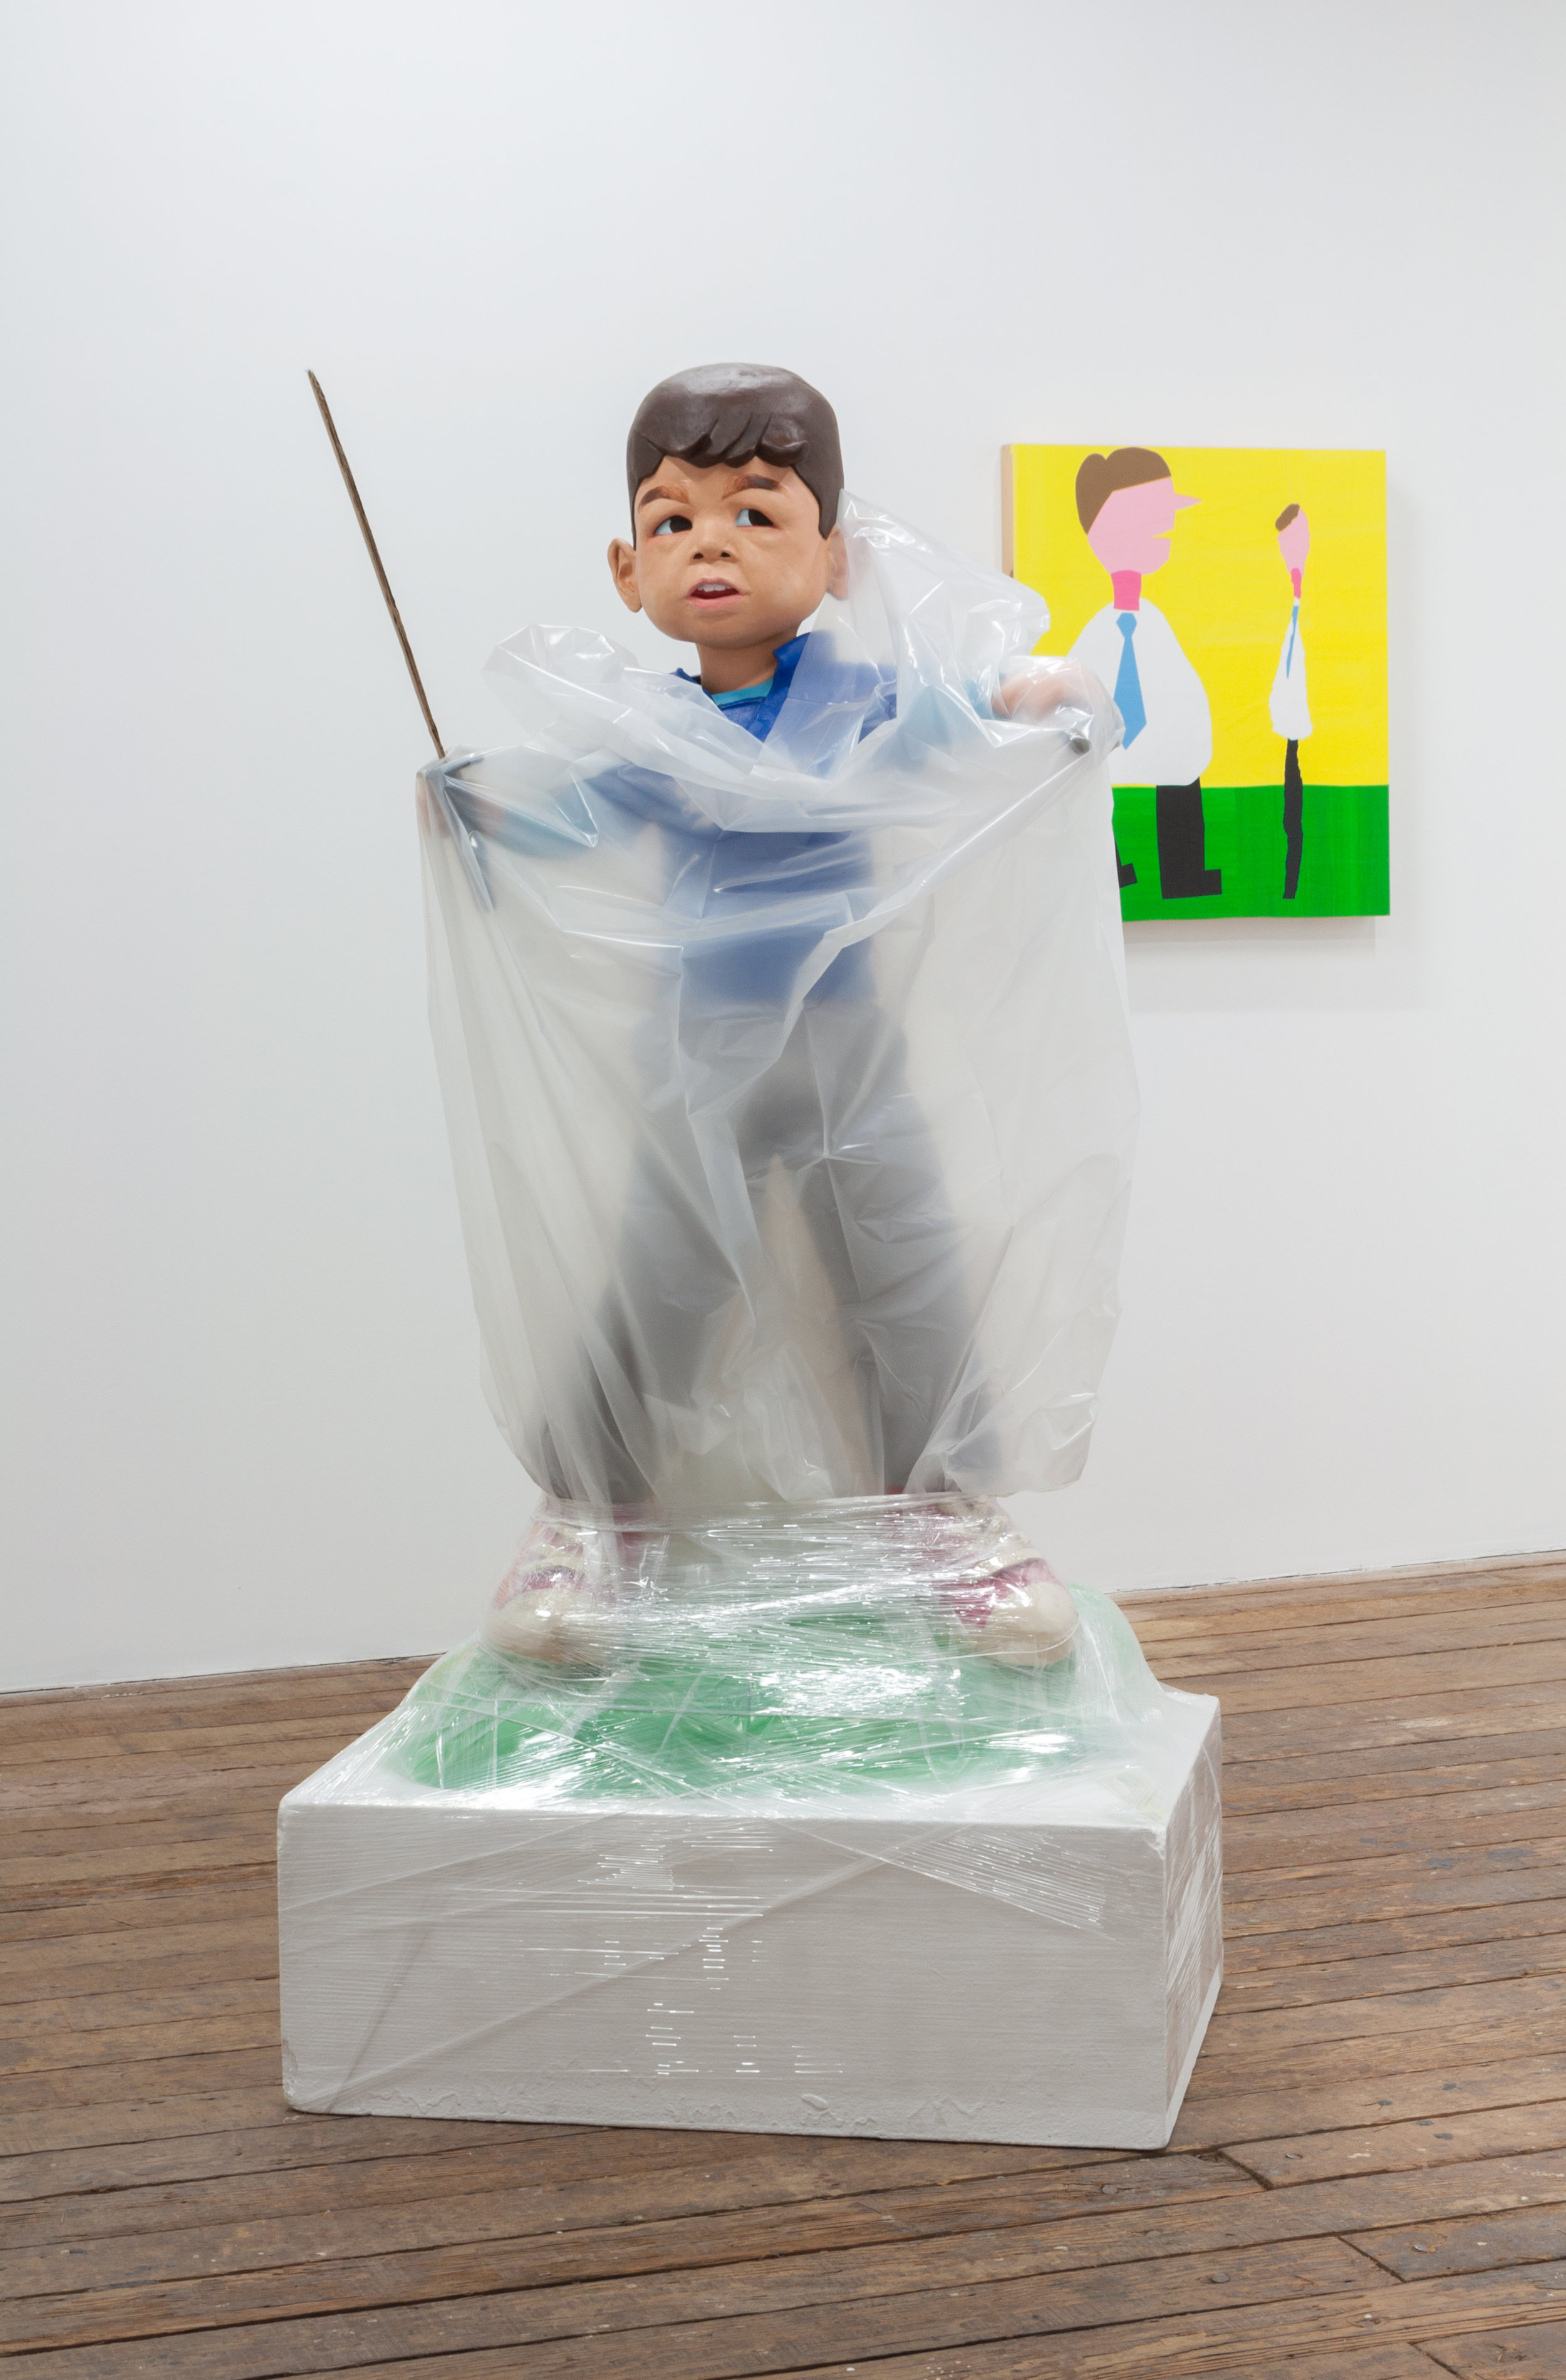 Carolina Maki Kitagawa,  when everything seems fine , 2016, ceramics, cardboard, plastic